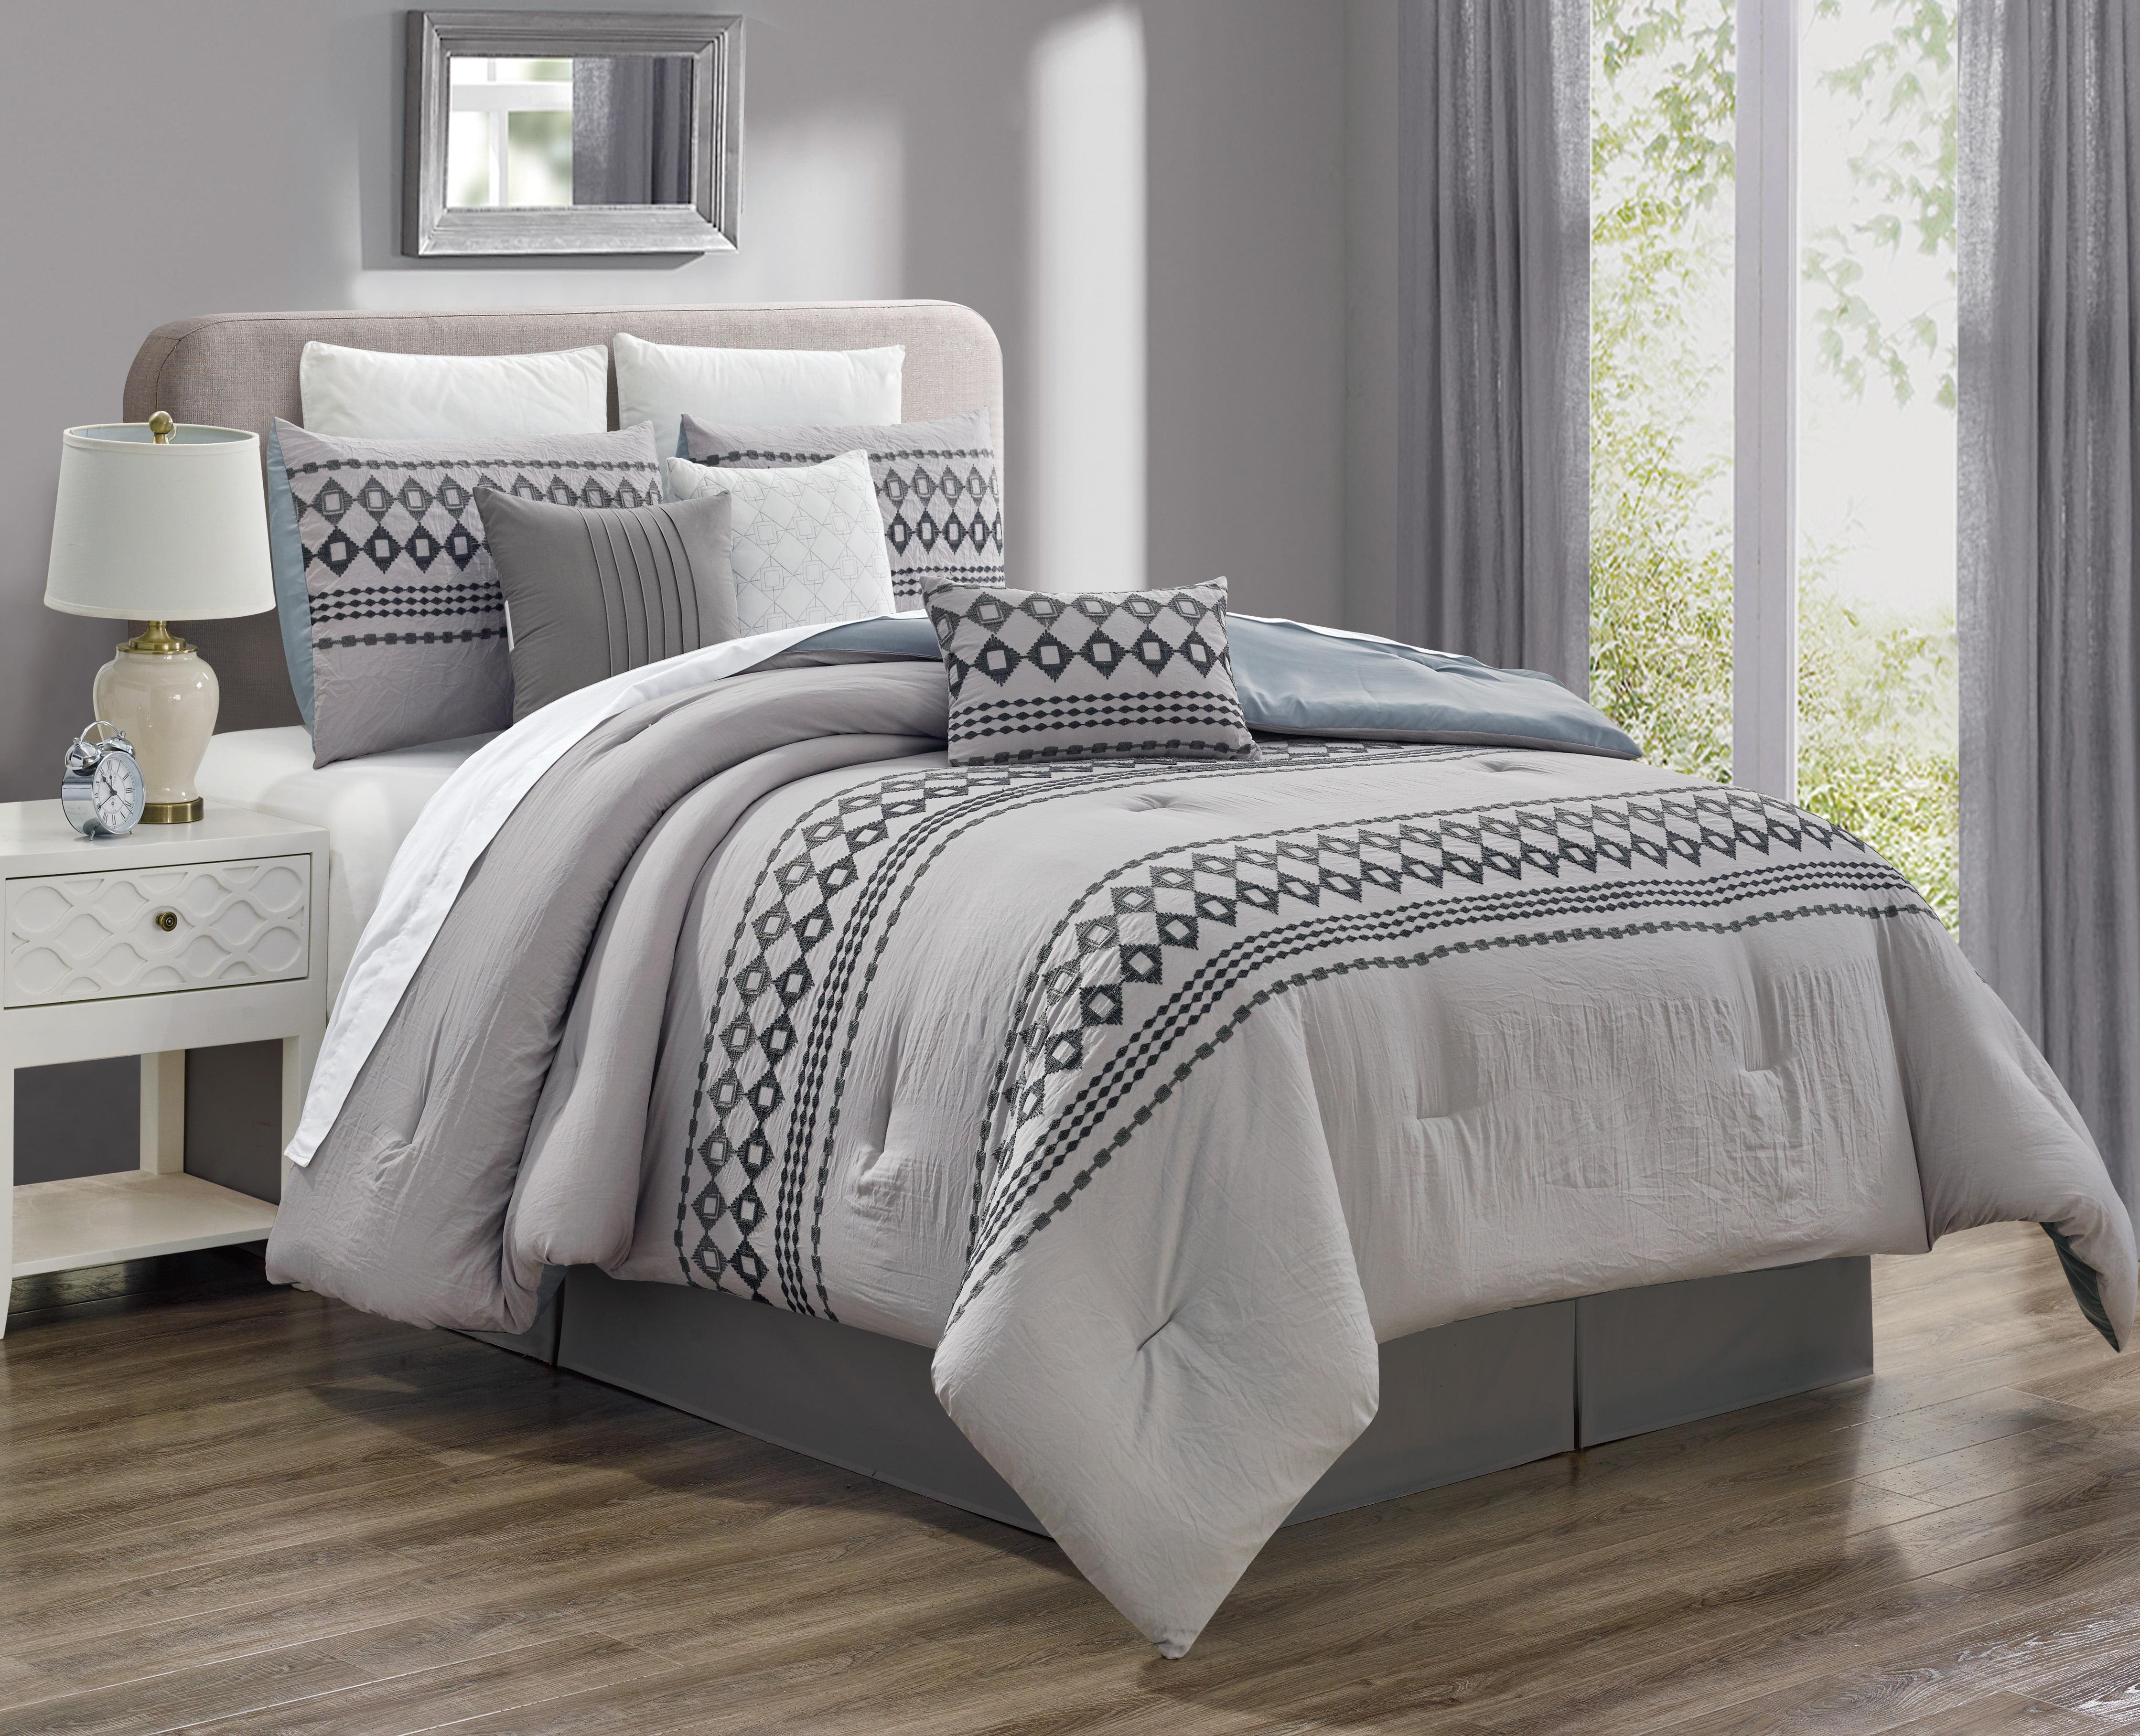 Discount Comforter Sets Clearance Cute Queen Floral 7 Piece Modern Room Bedding Comforters Bedding Sets Home Garden Pumpenscout De